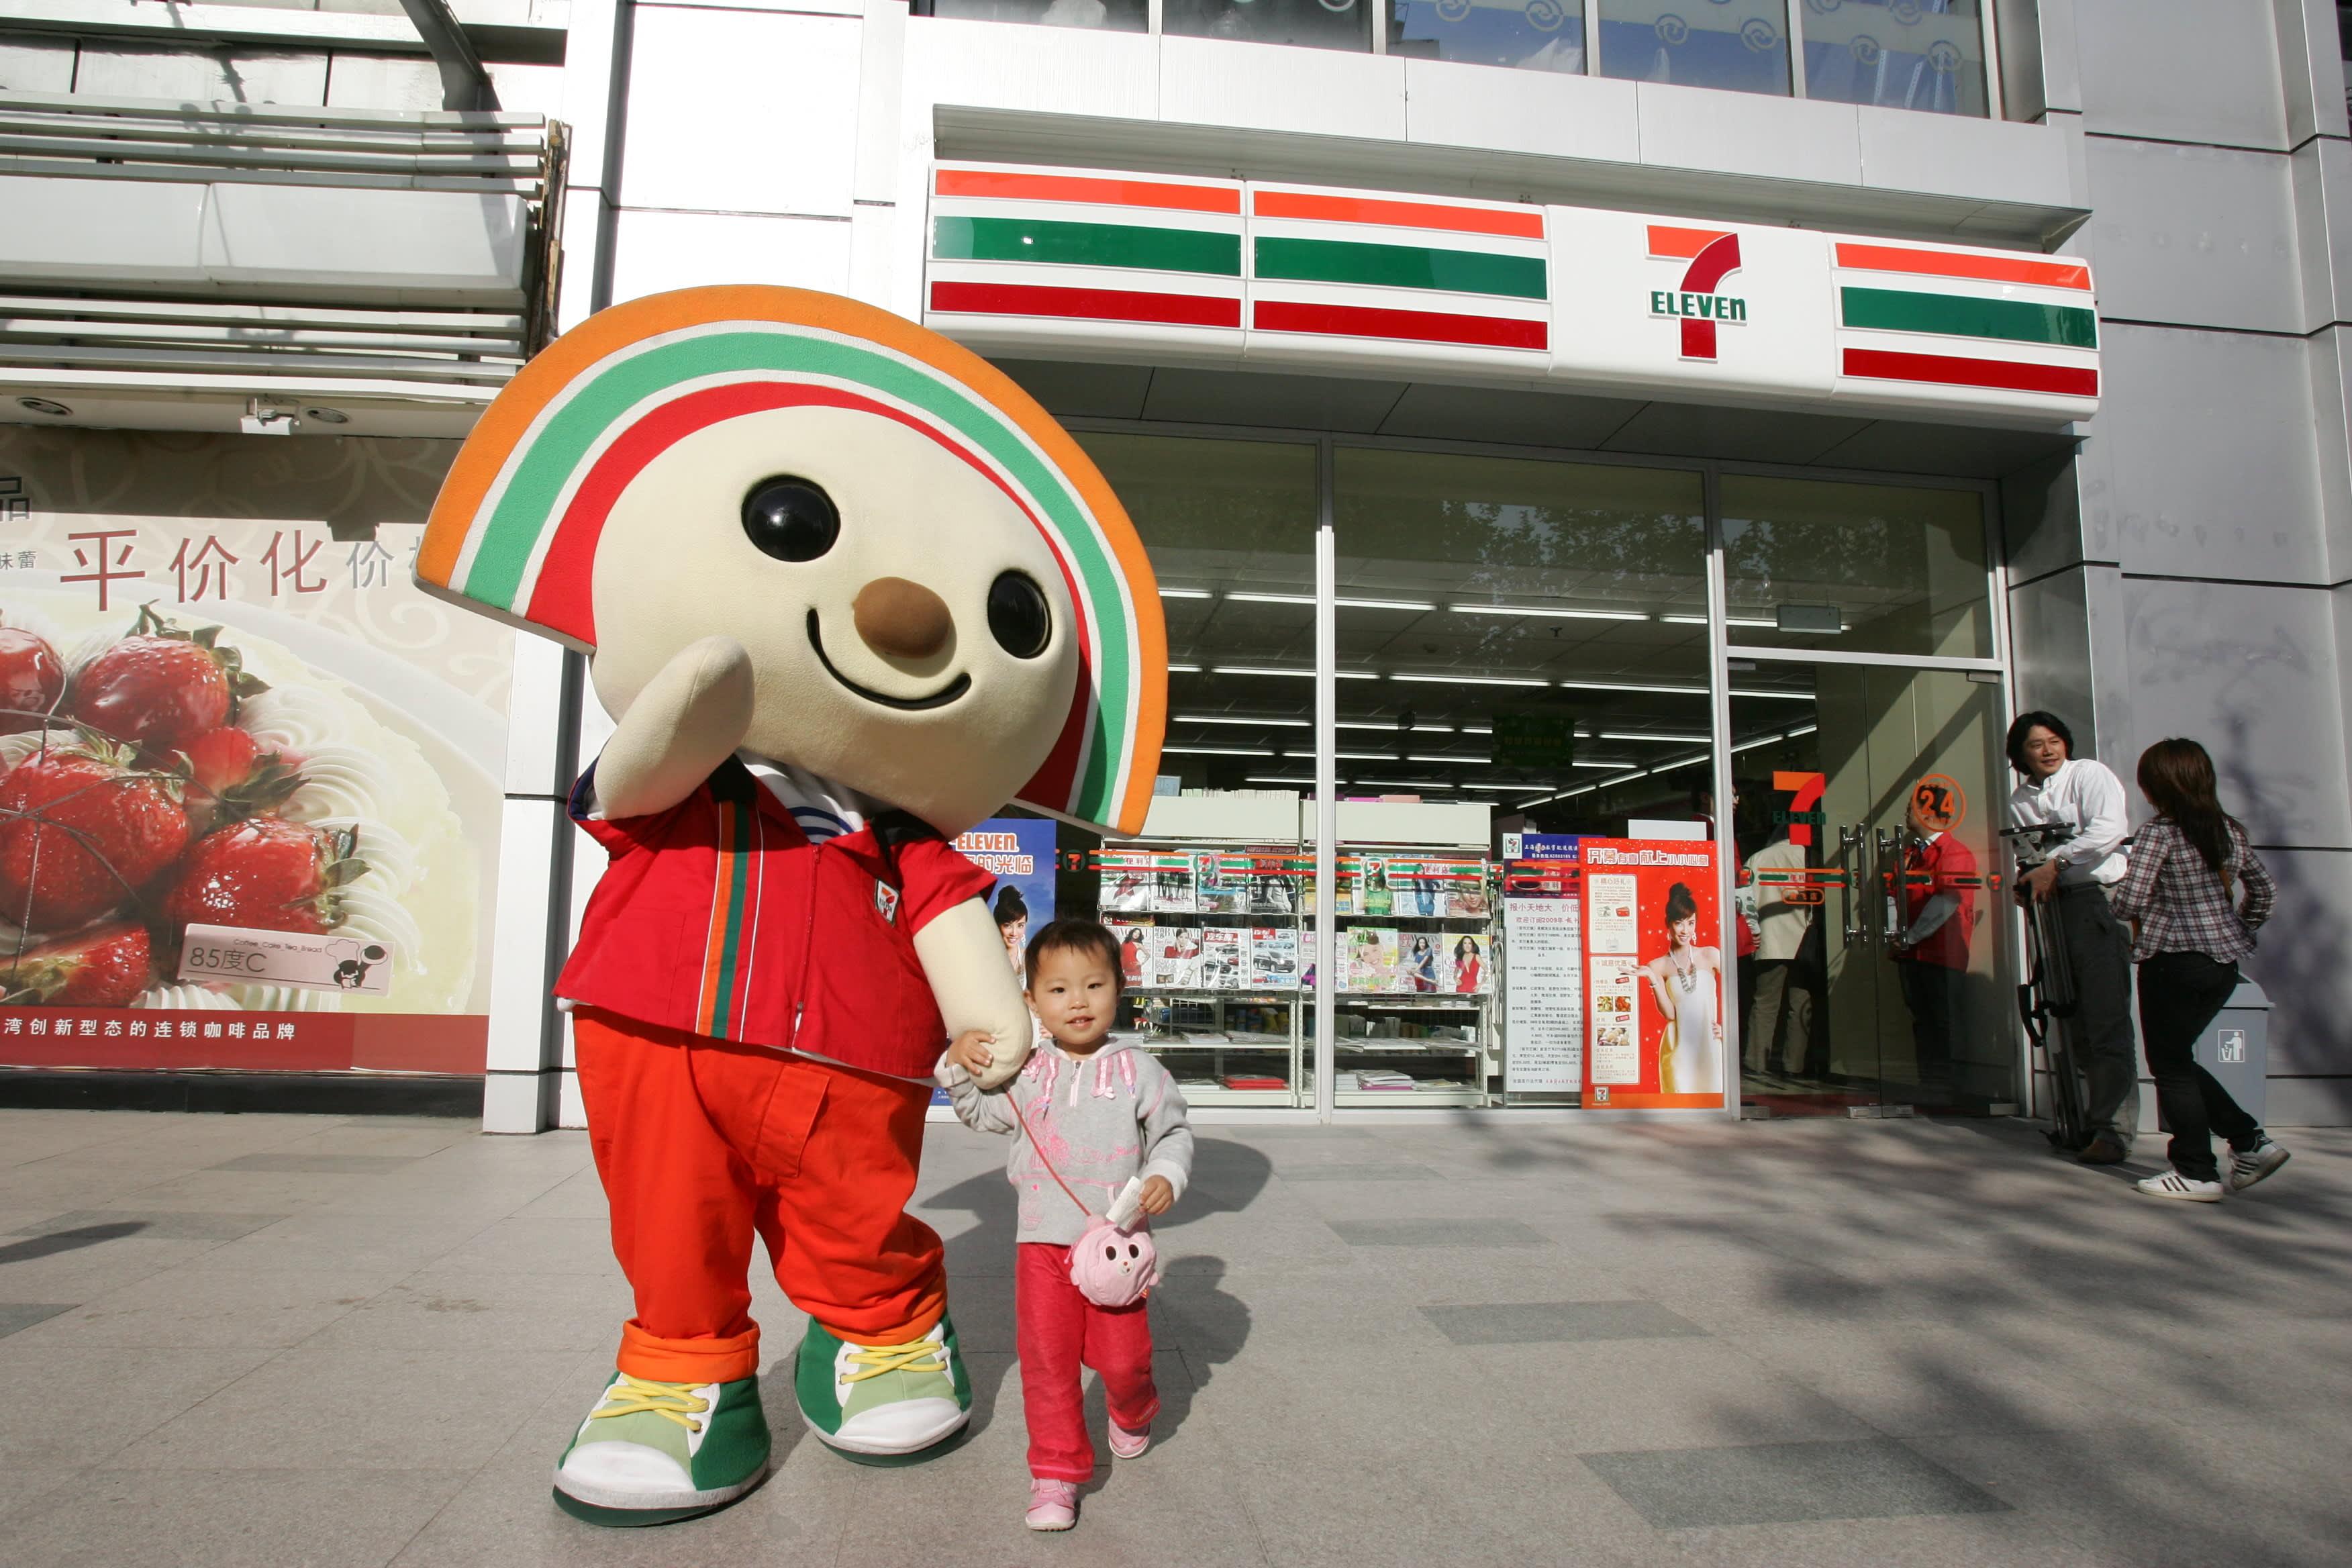 Chinas Convenience Store Segment Booms 7 Eleven Familymart Ones